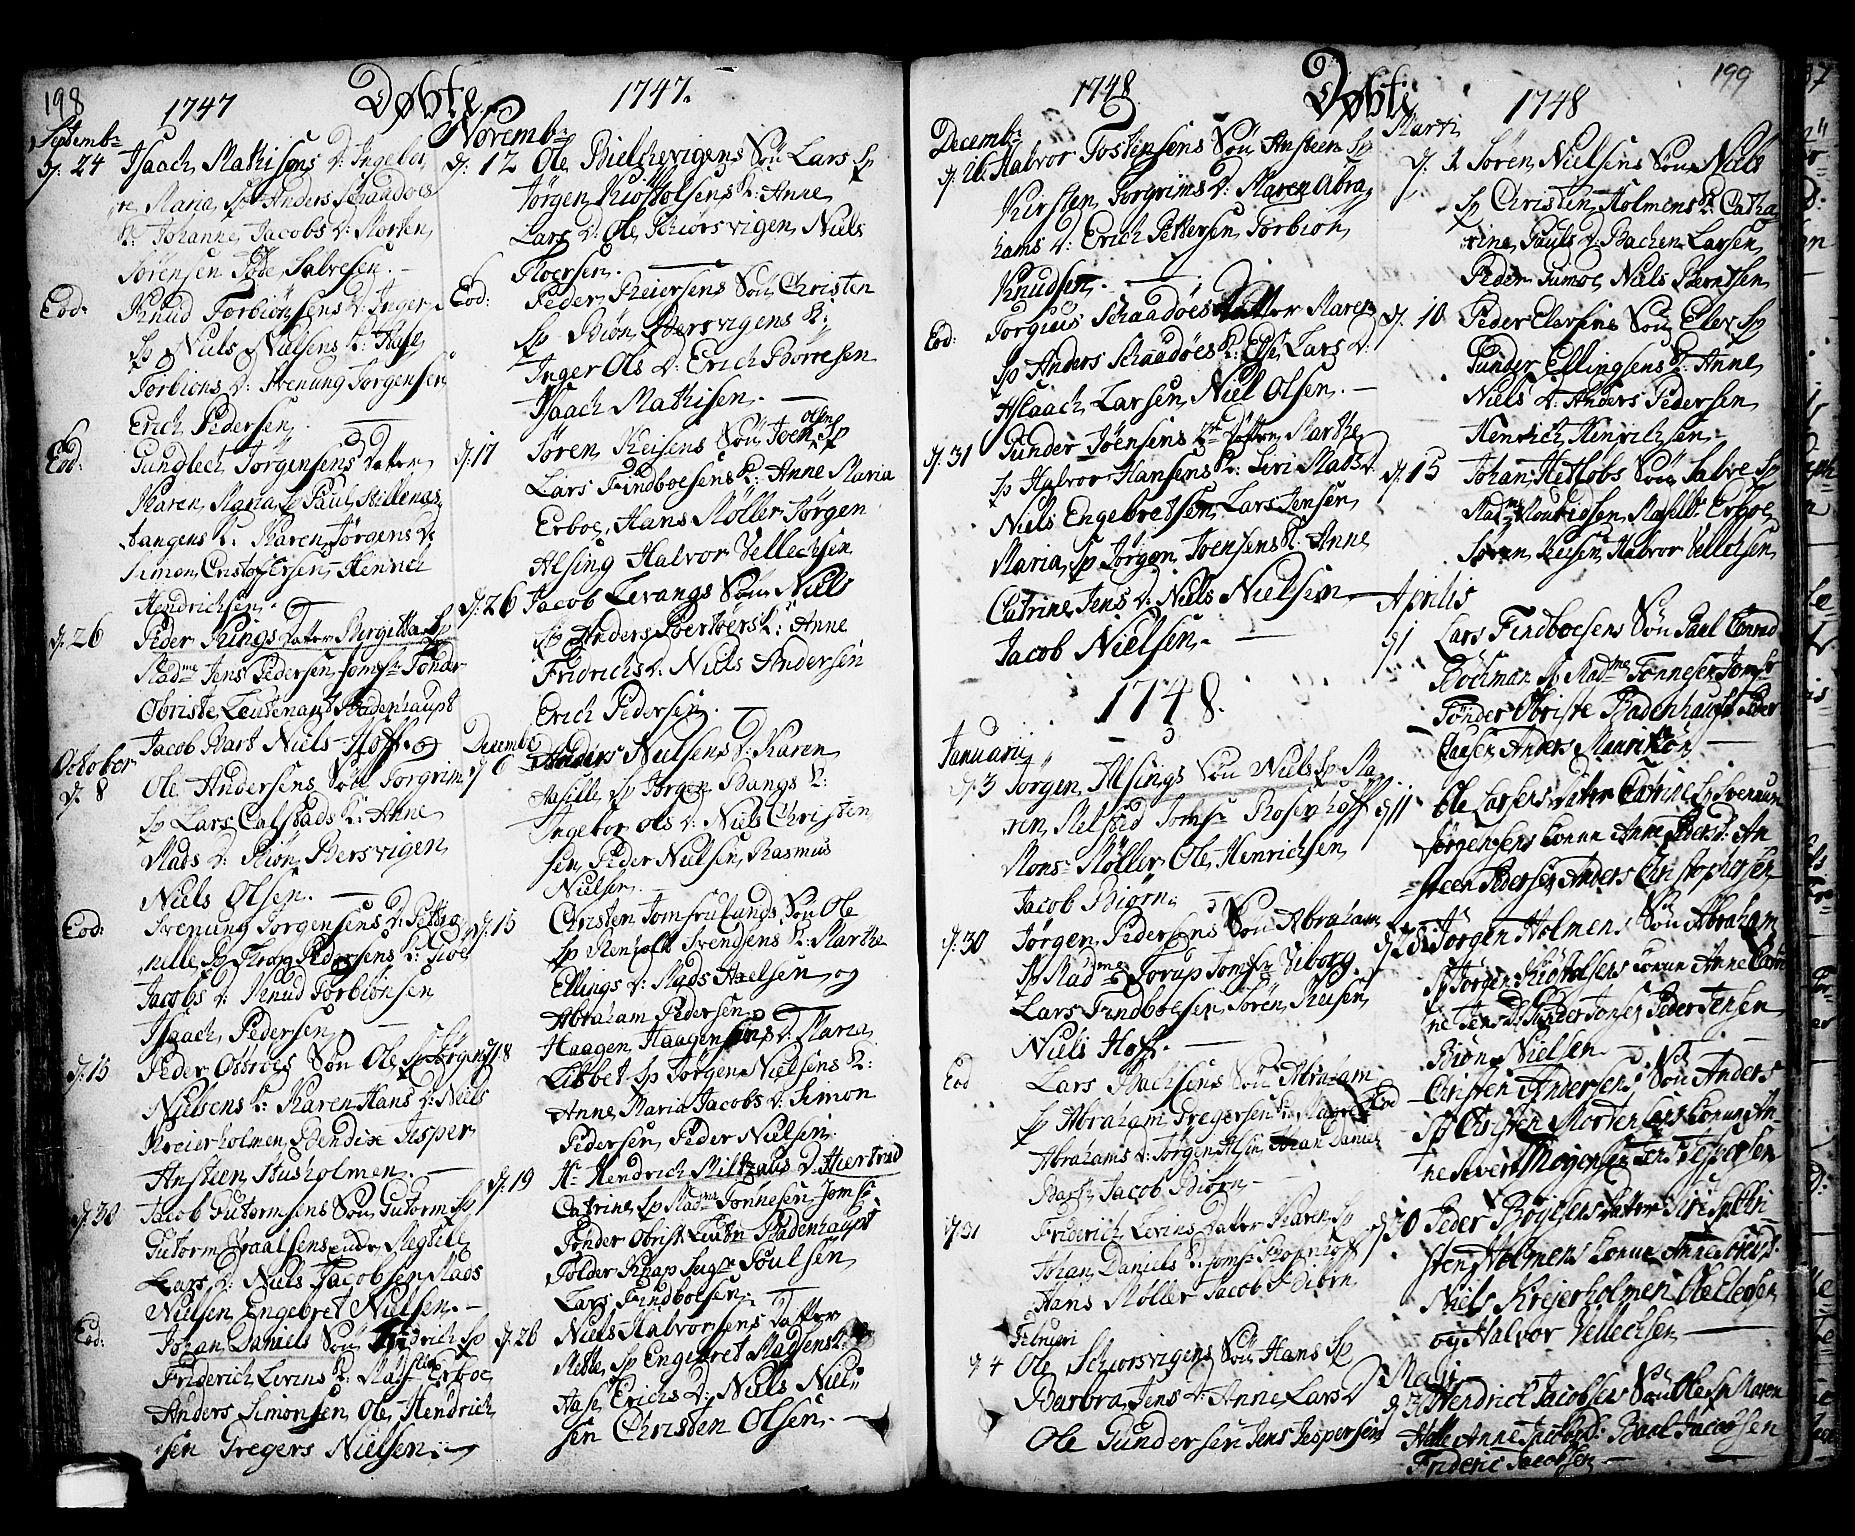 SAKO, Kragerø kirkebøker, F/Fa/L0001: Ministerialbok nr. 1, 1702-1766, s. 198-199